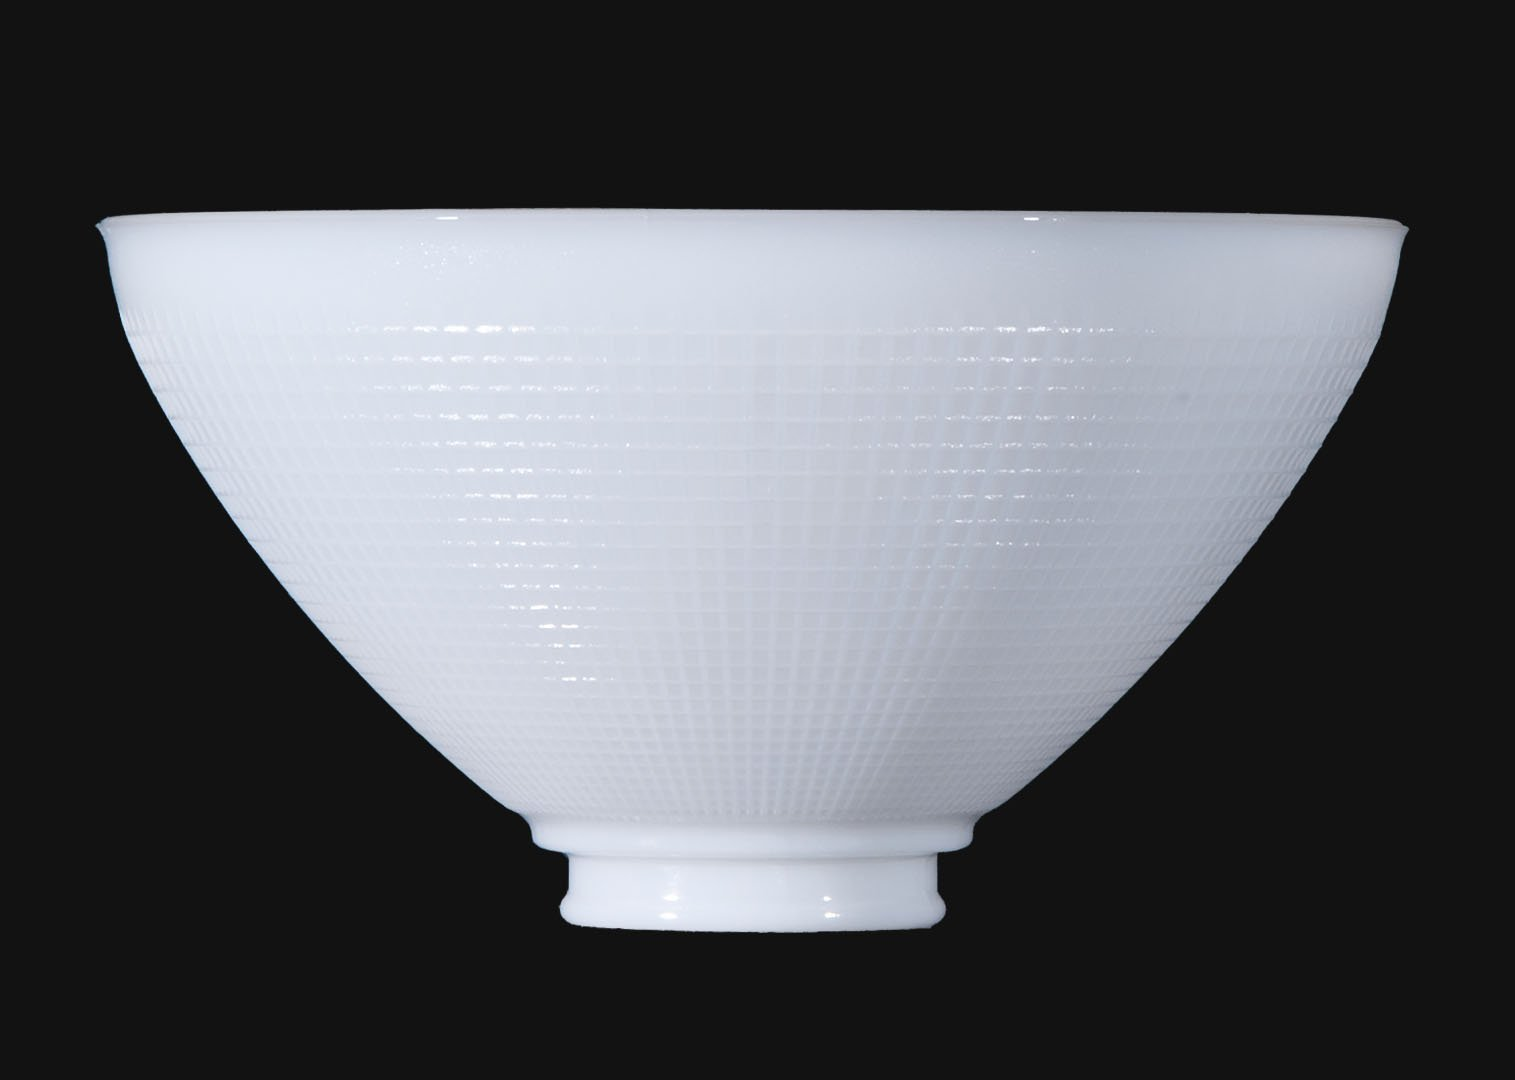 B&P Lamp 10'' I.E.S Opal Glass Reflector Shade for Floor Lamps and Mogul Sockets - Sets Below the Floor Lamp Shade